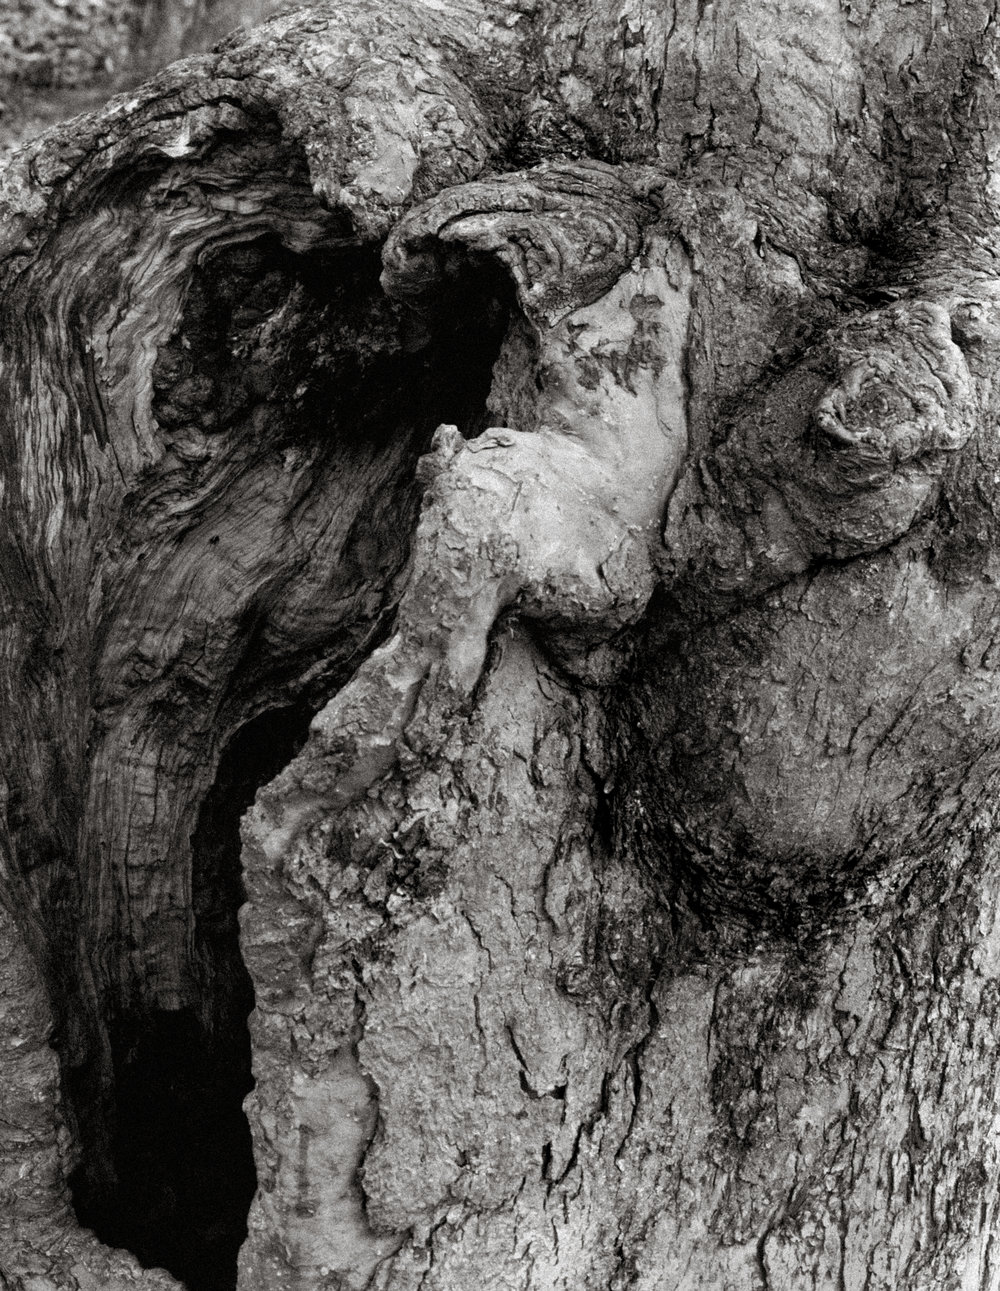 Treehole1.jpg